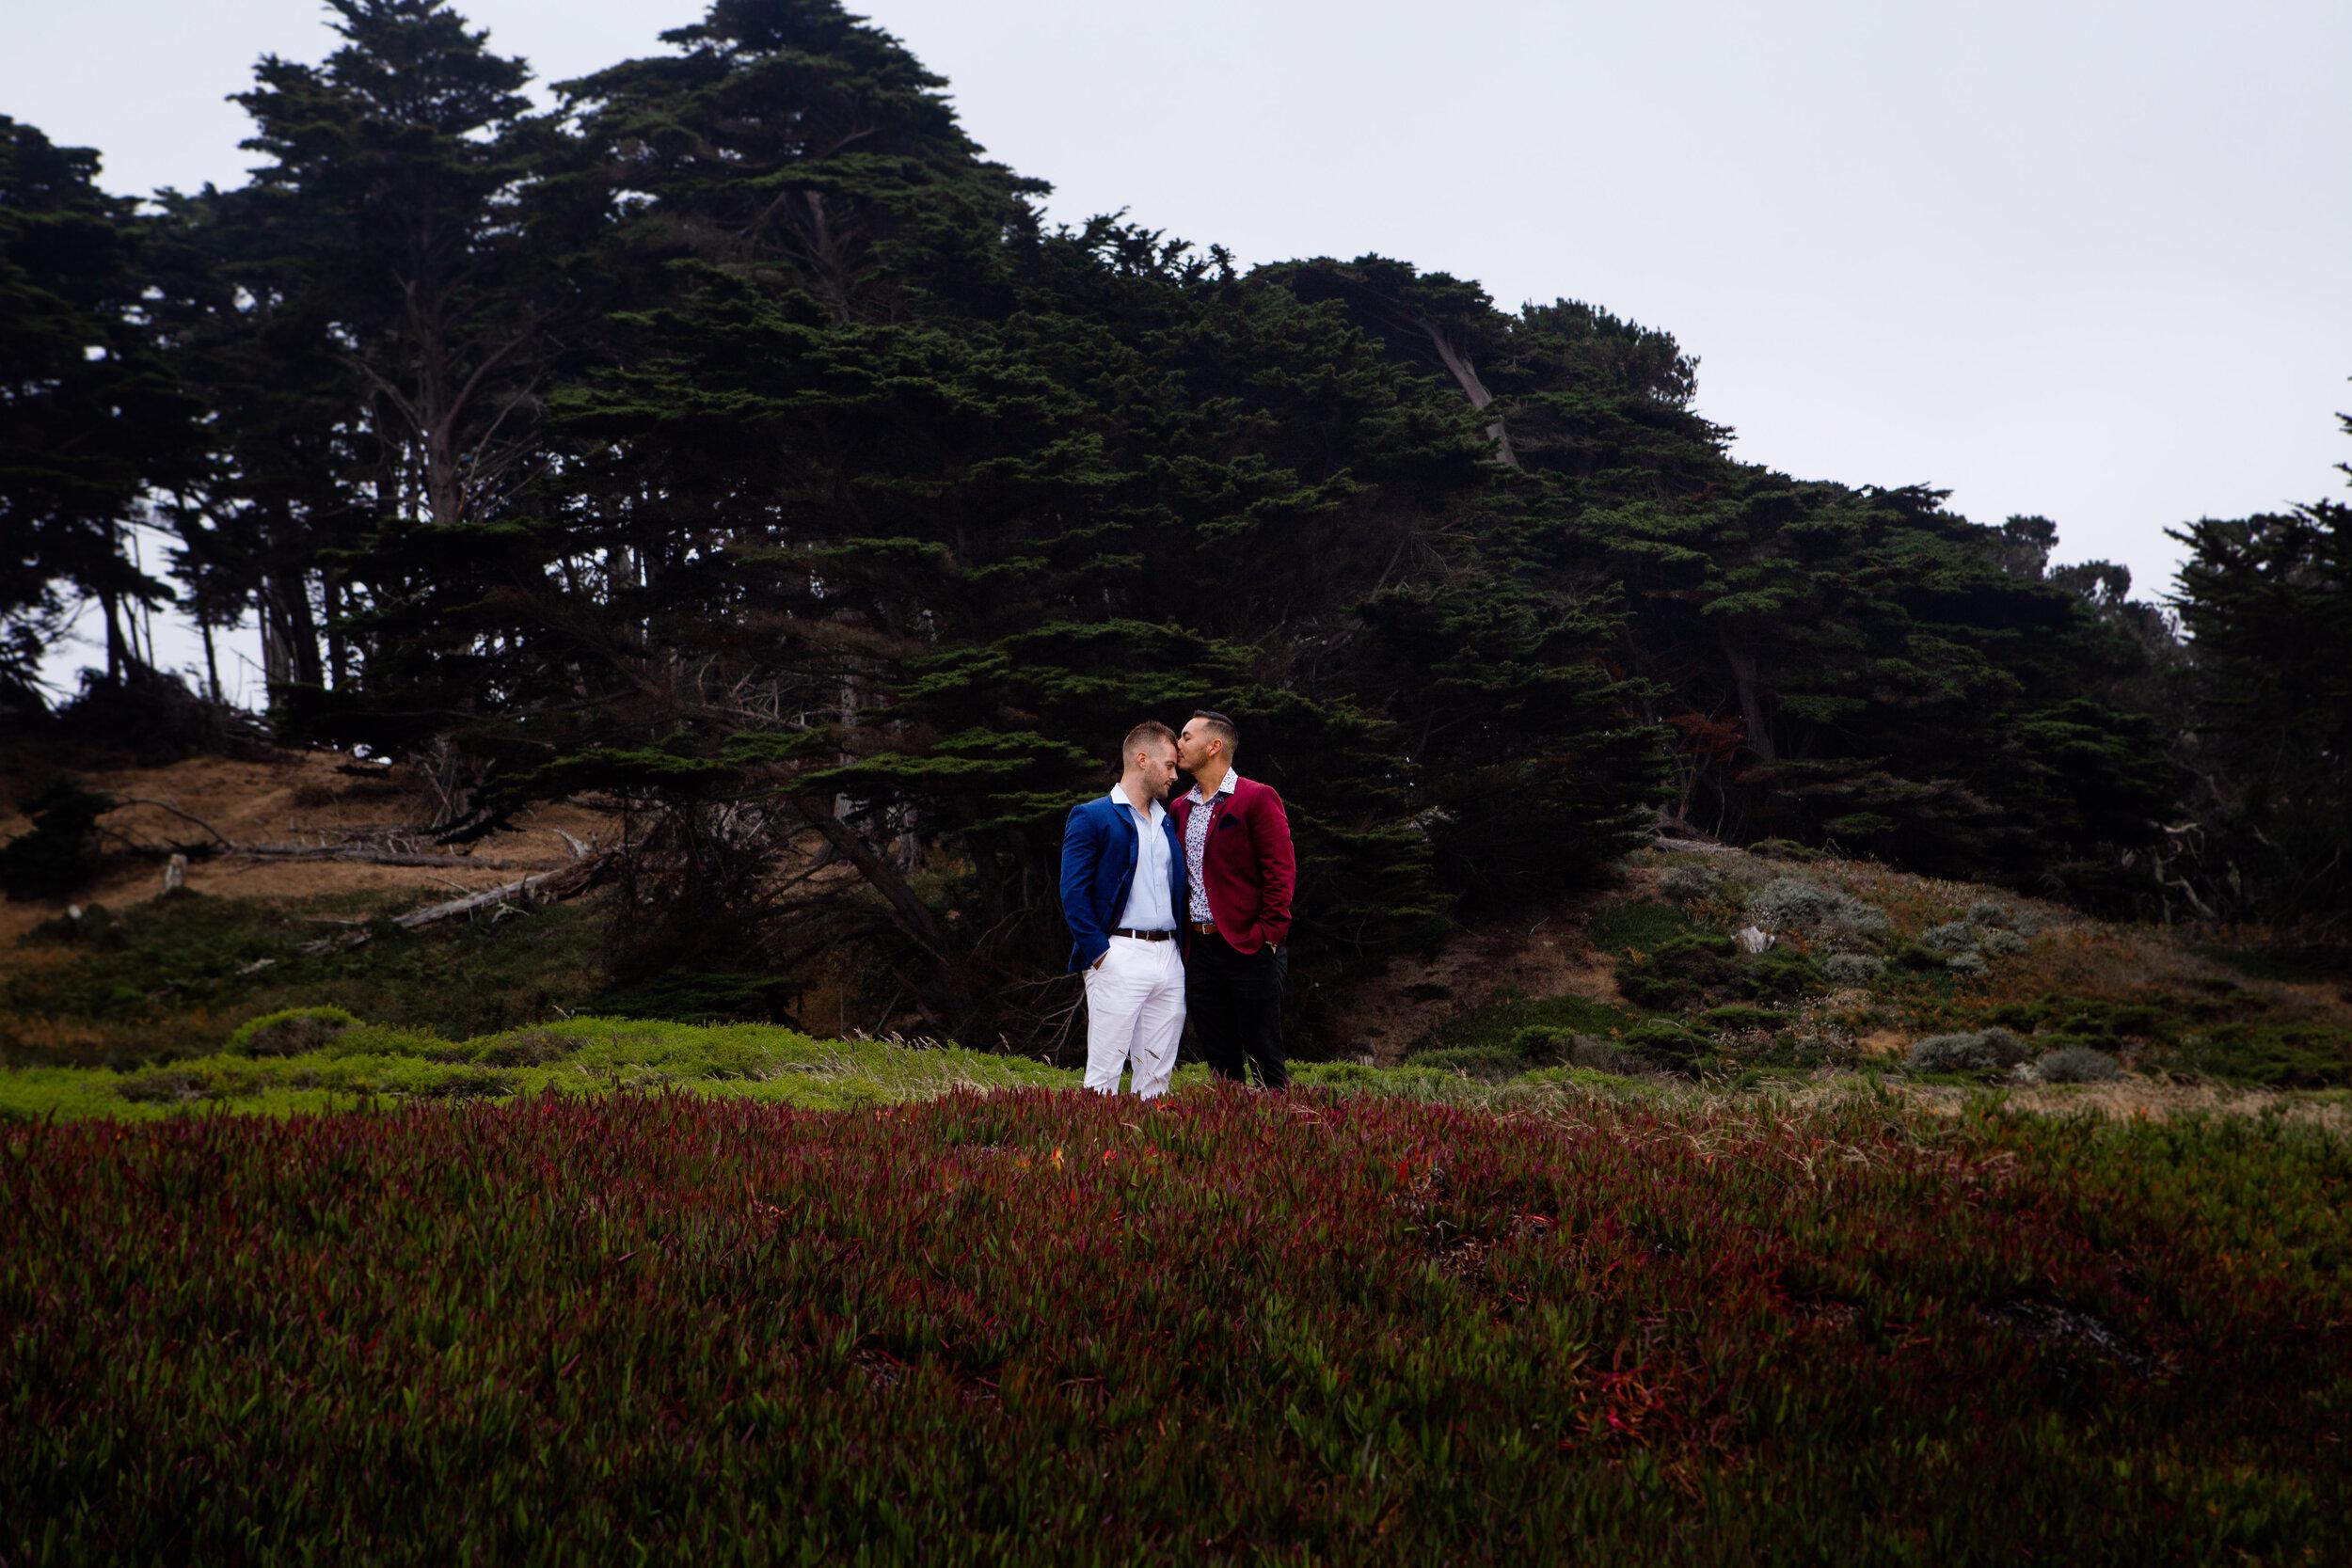 20190726-California-Bakers Beach San Francisco-Mauricio and Parick--63.jpg